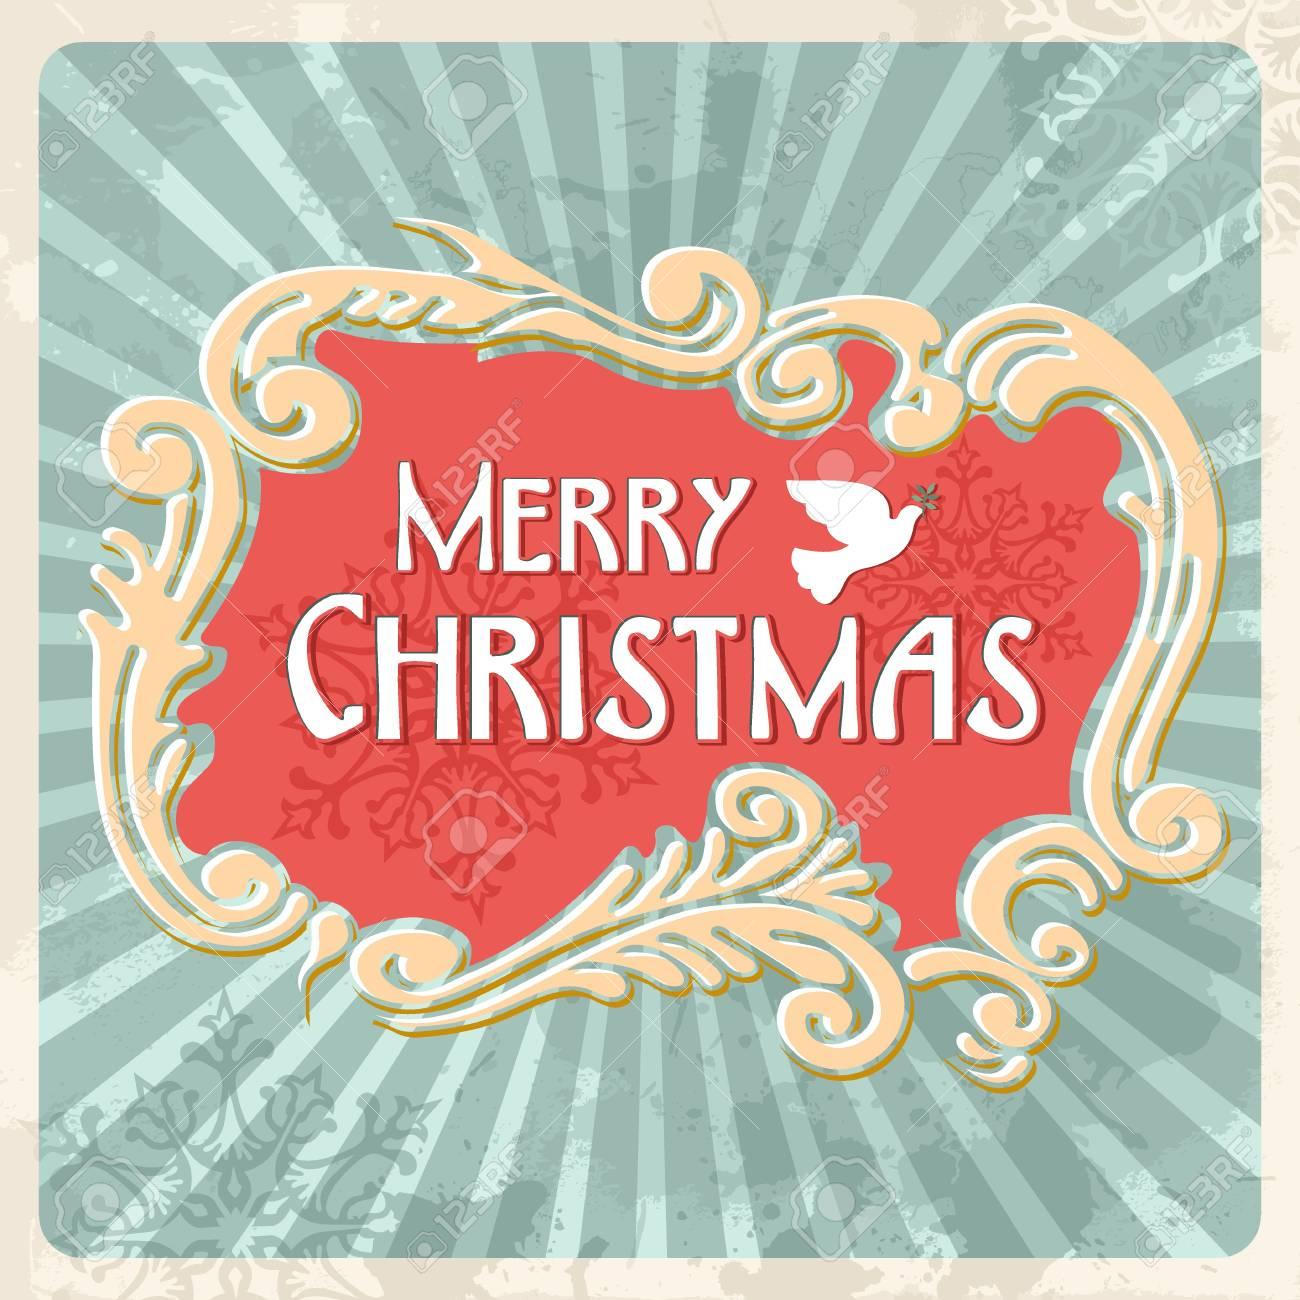 Happy christmas retro sign illustration. Stock Vector - 16463922